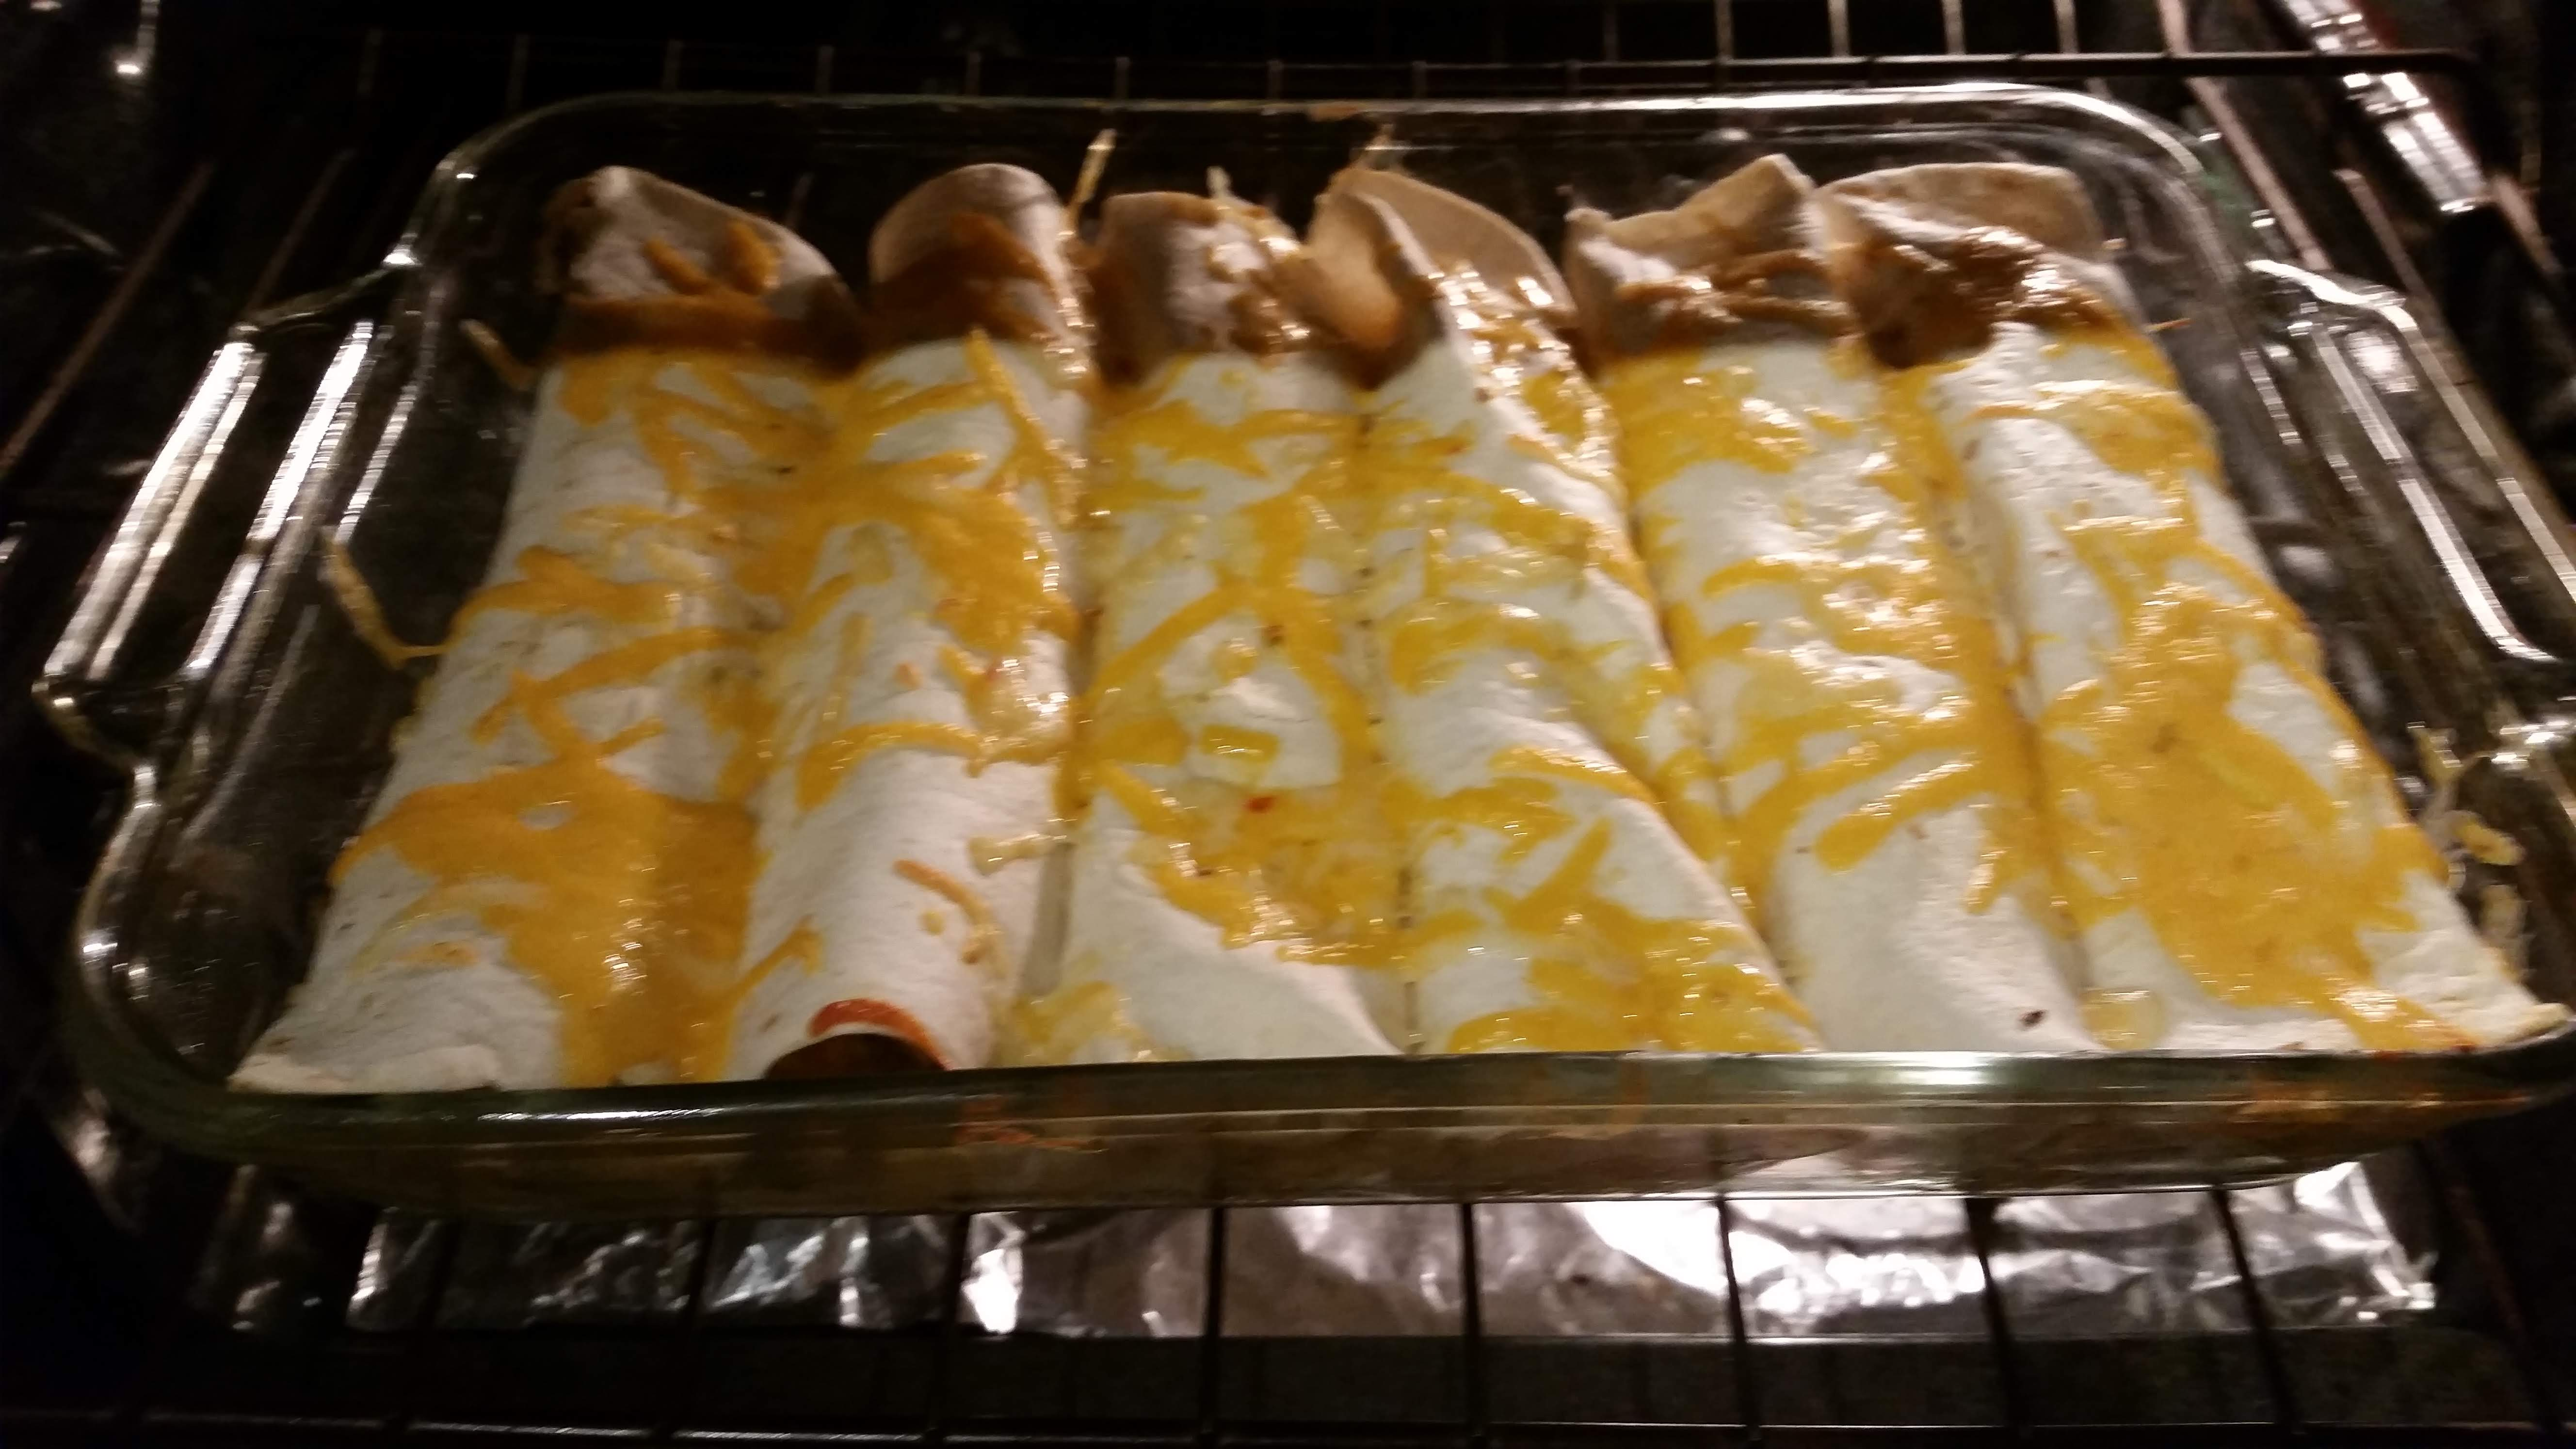 Baked Chipotle Chicken Flautas LRM